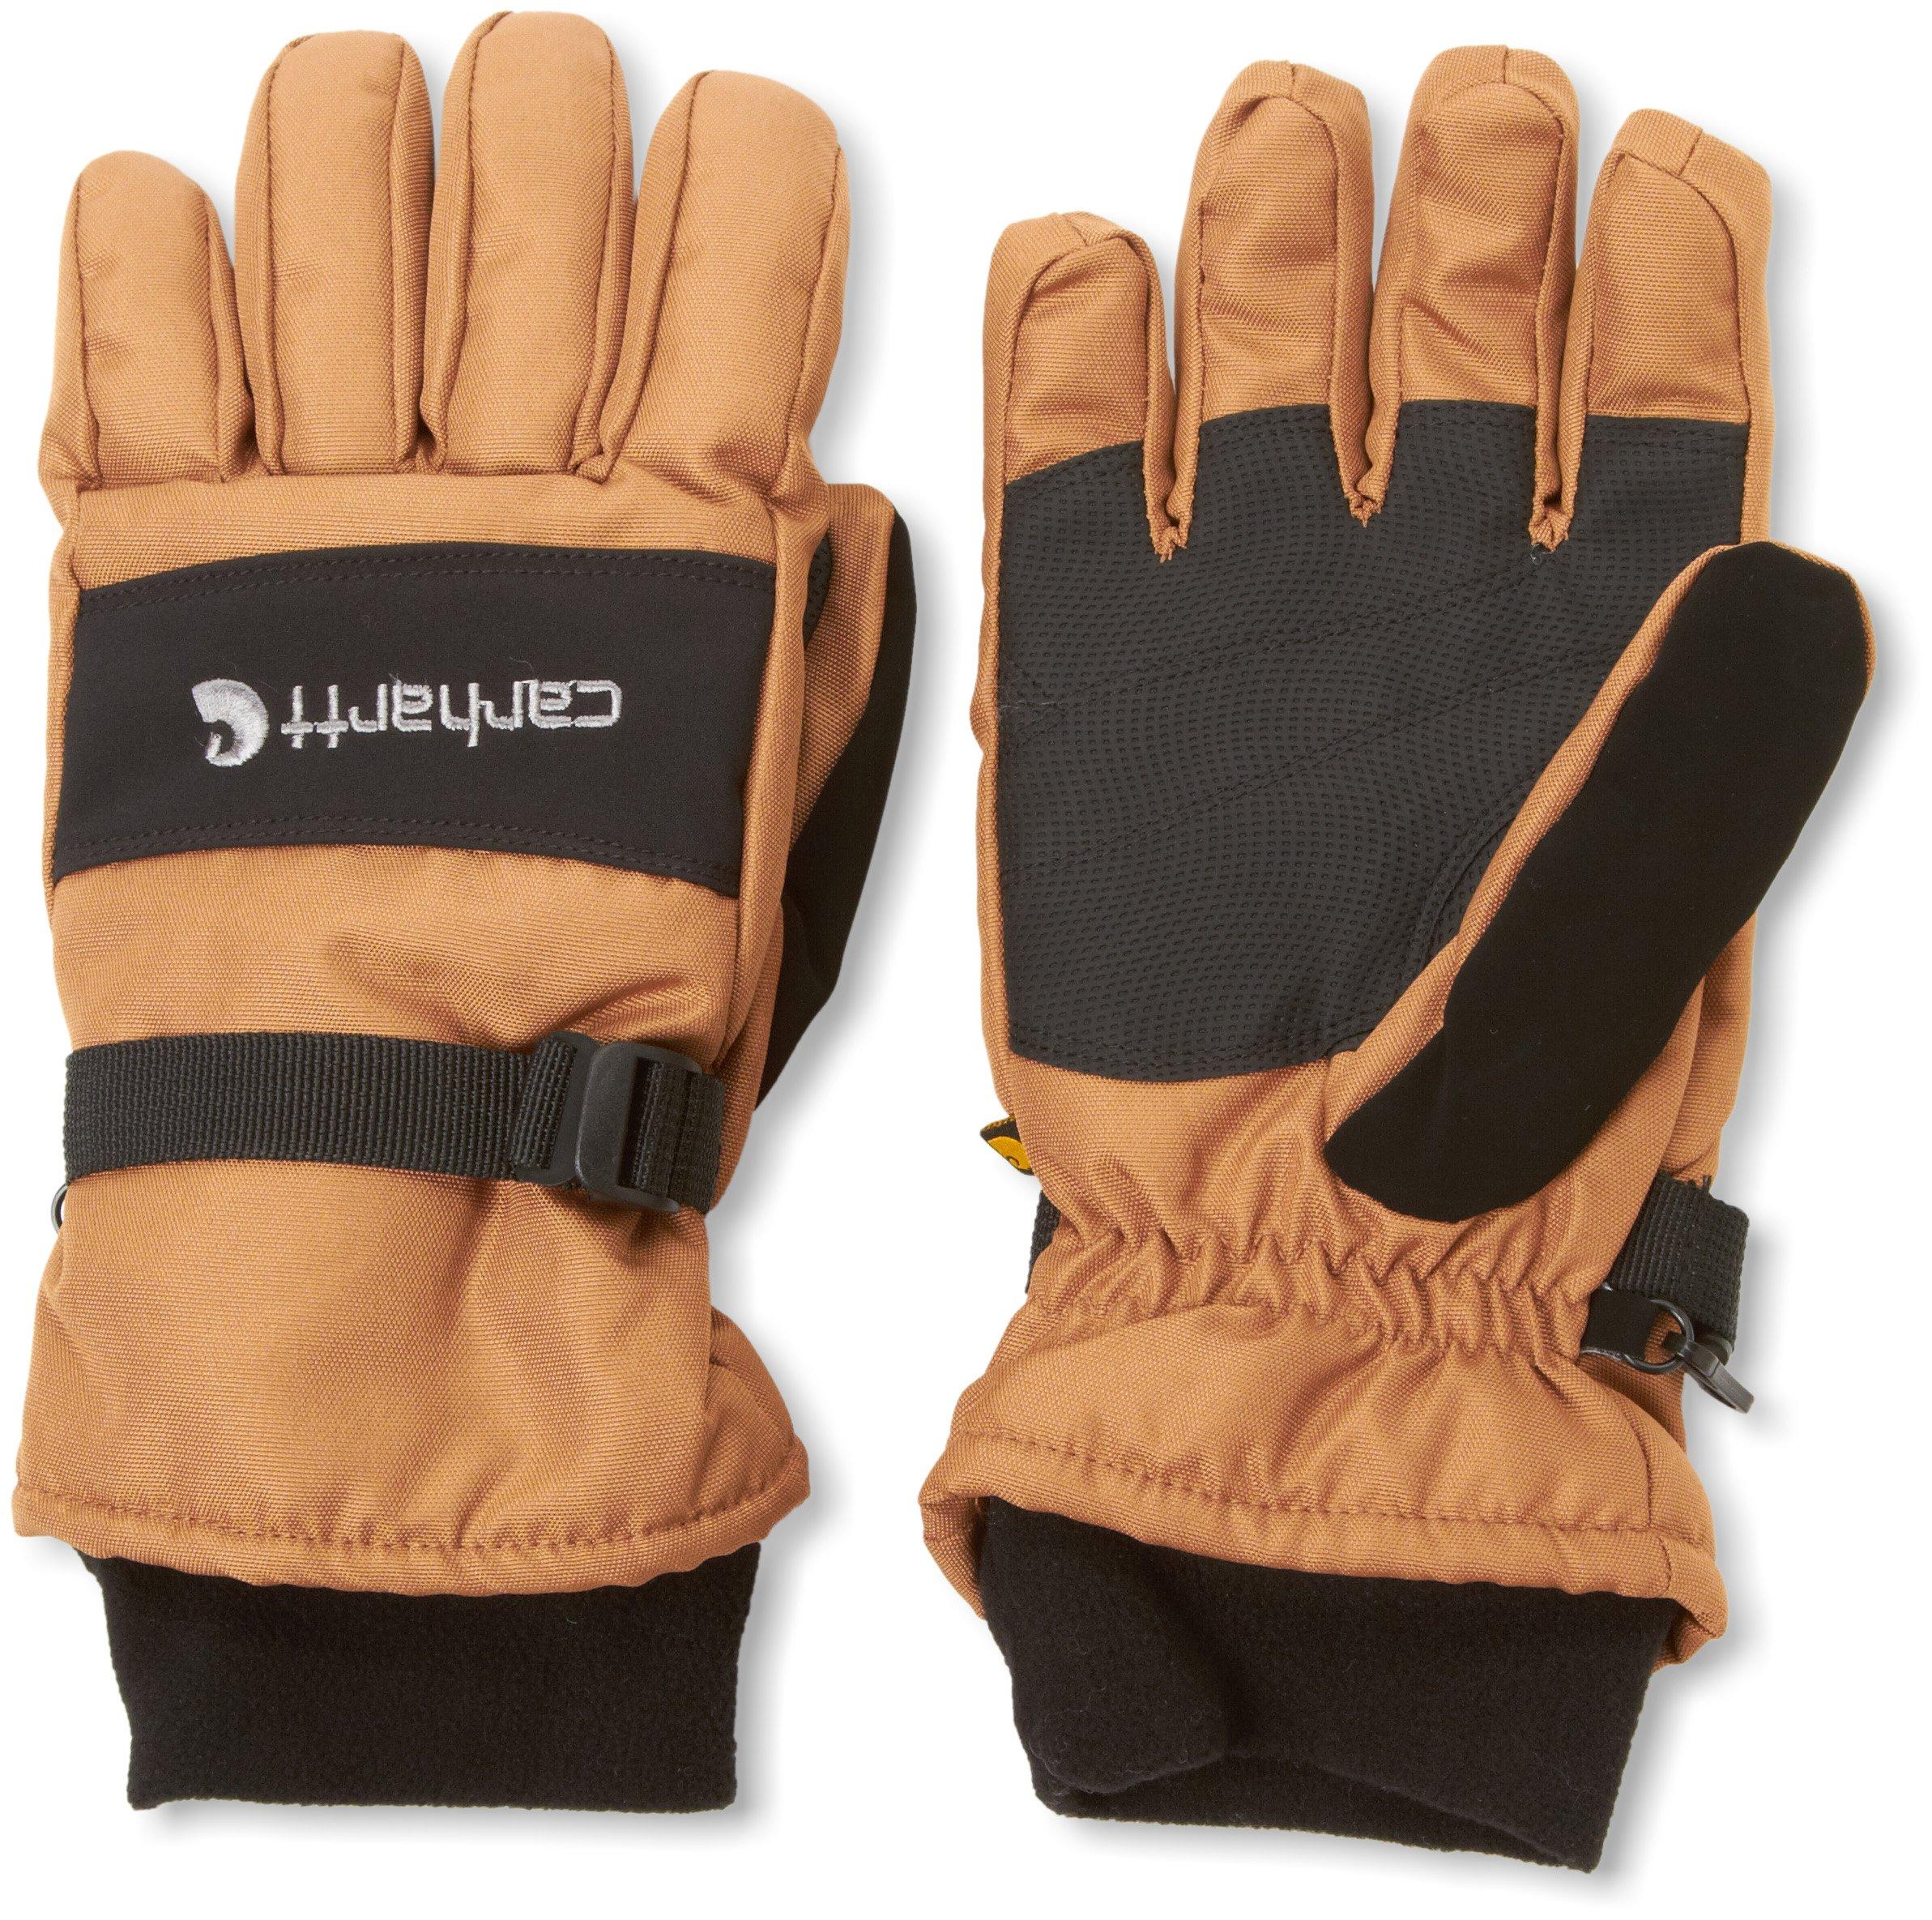 Carhartt Men's W.P. Waterproof Insulated Work Glove, Brown/Black, Large